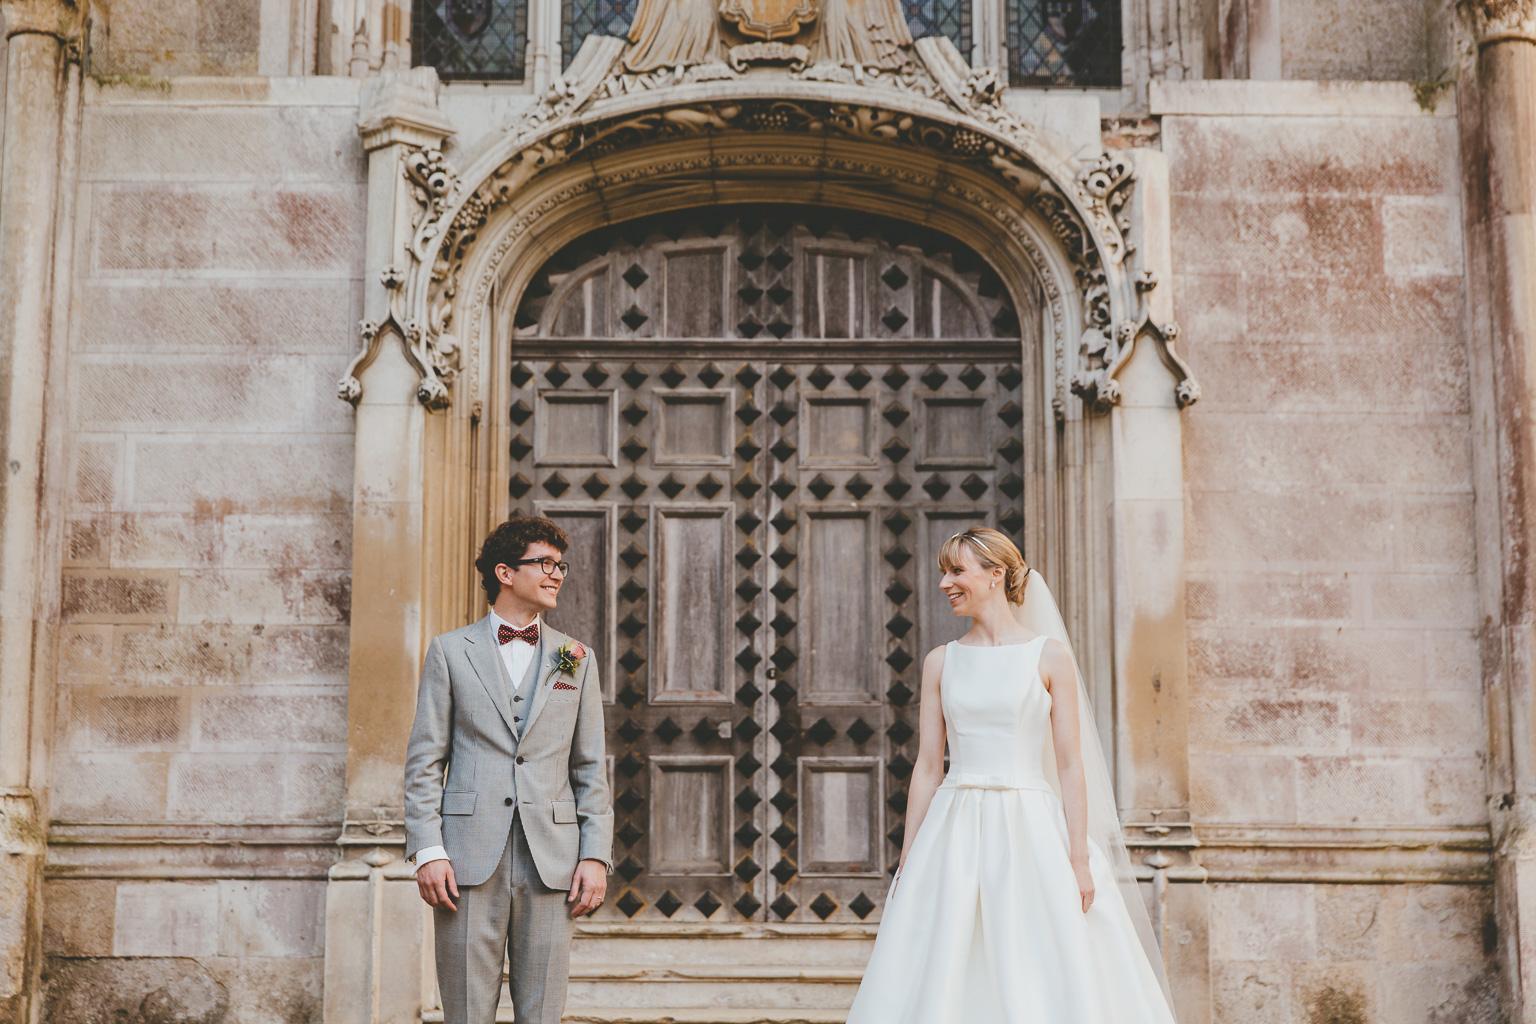 Documentary-wedding-photographer-00005